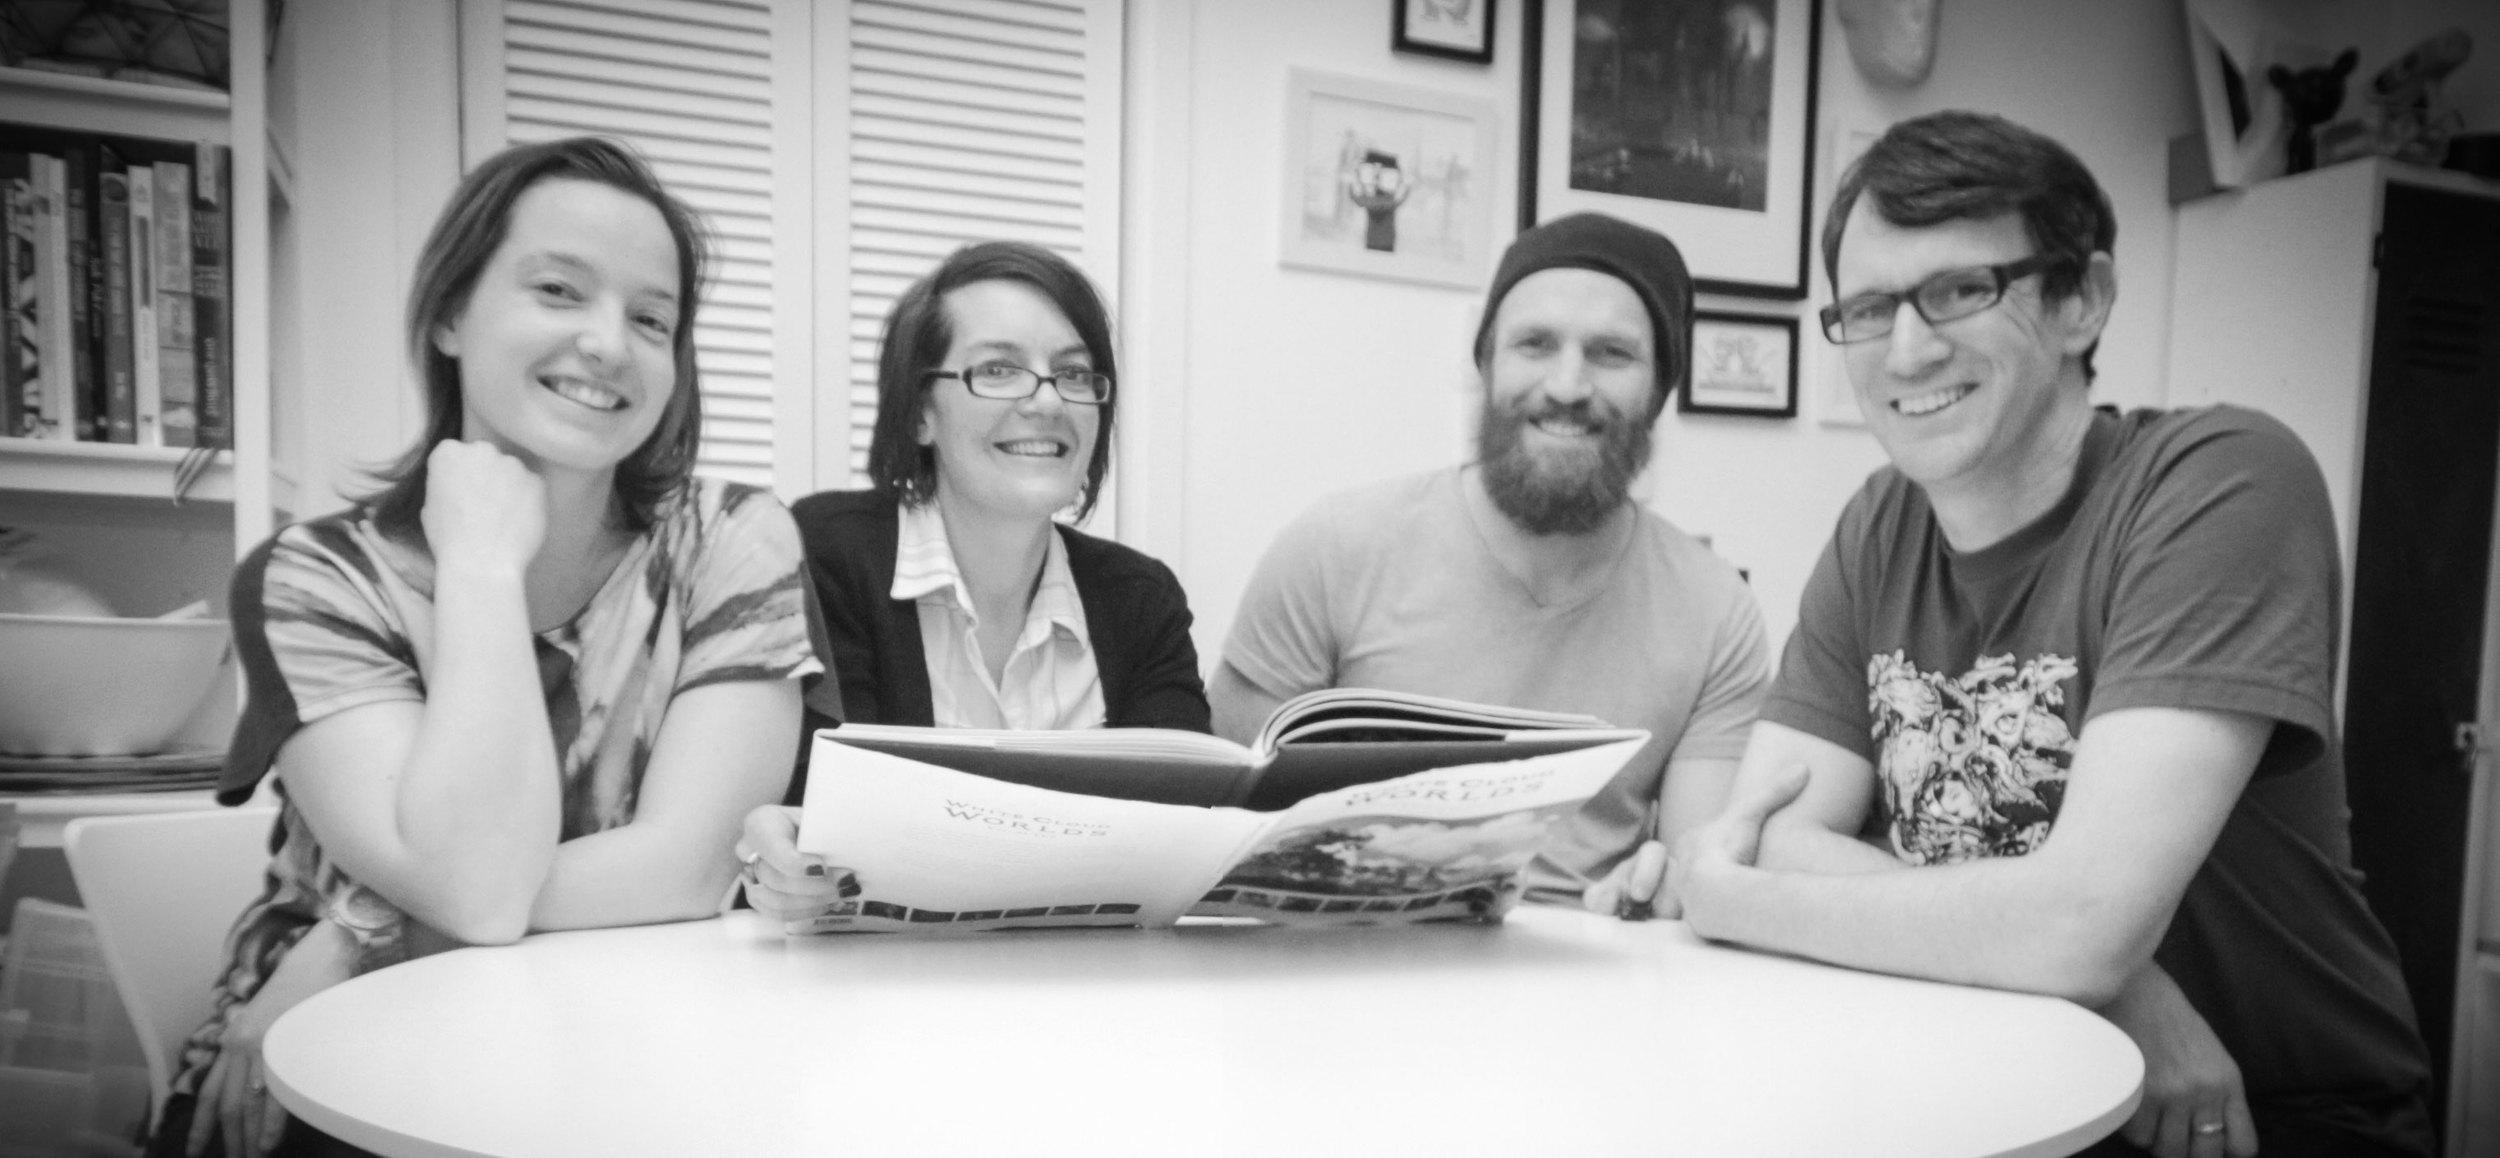 From left: Monique Hamon (Layout Artist) , Kate Jorgensen (Project Manager), Isaac Hamon (Marketing) and Paul Tobin (Founder/Editor).